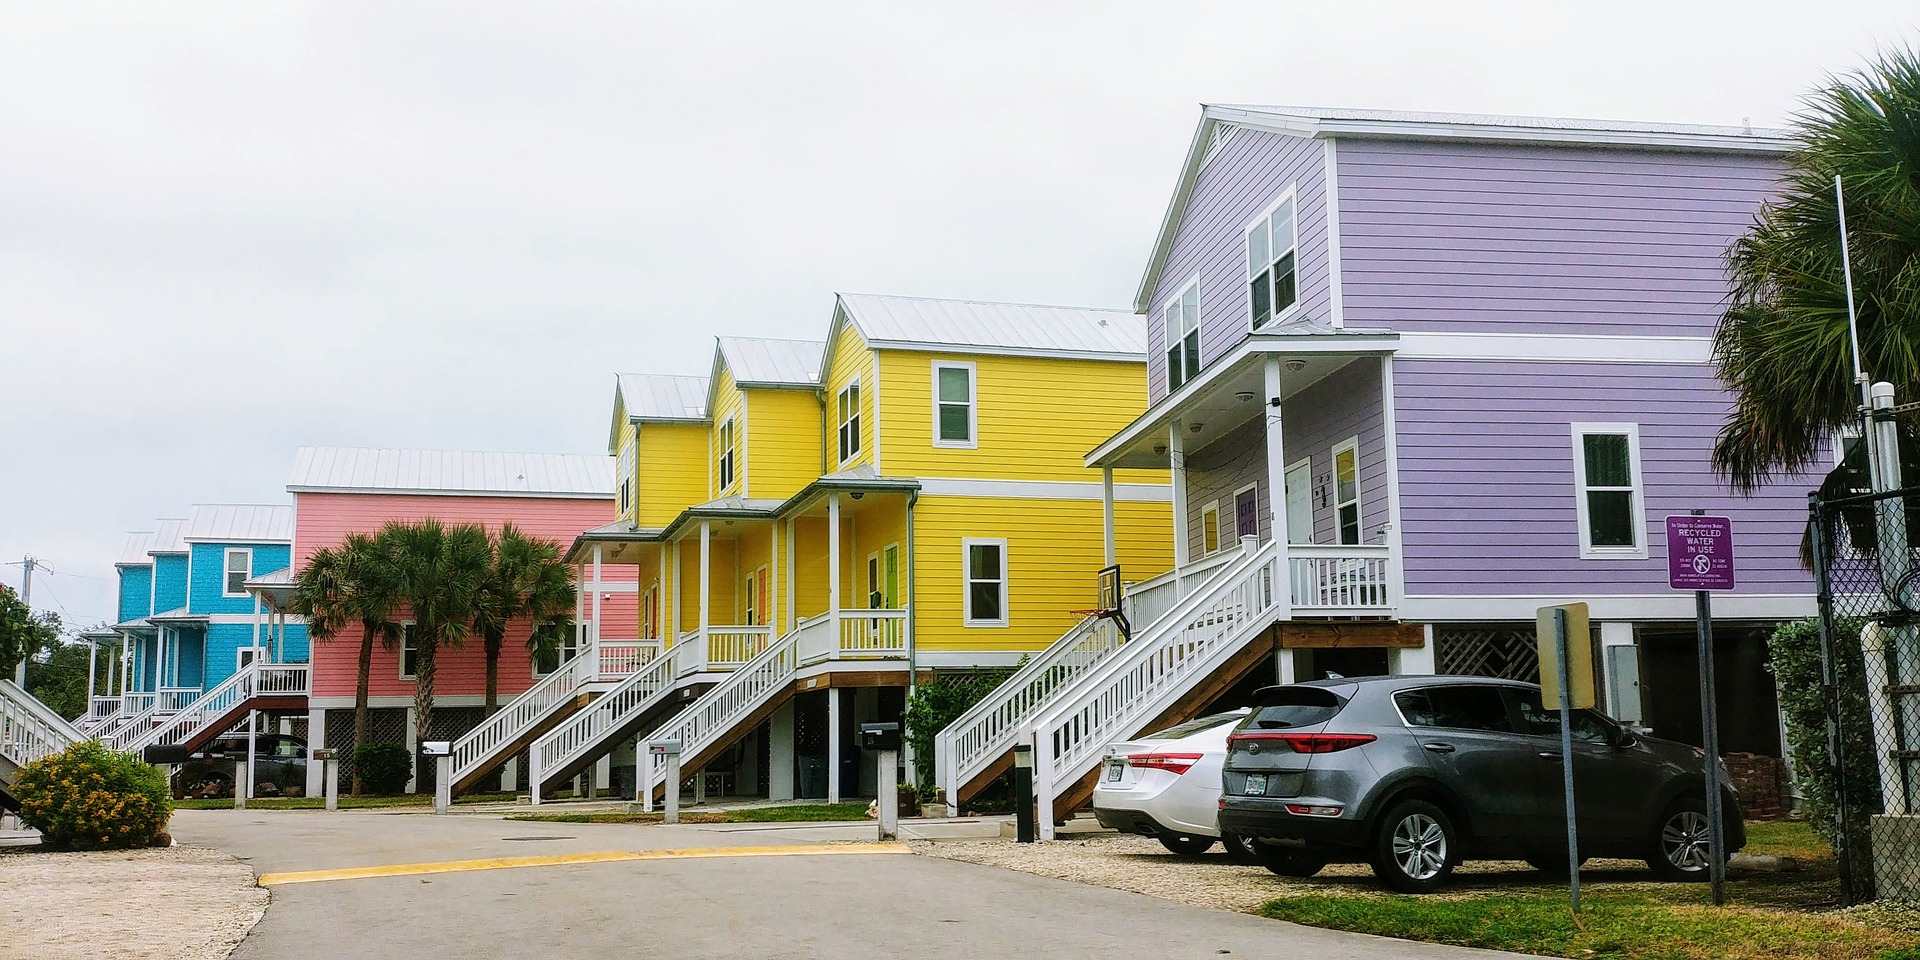 Florida Keys Reise Karibik Flair